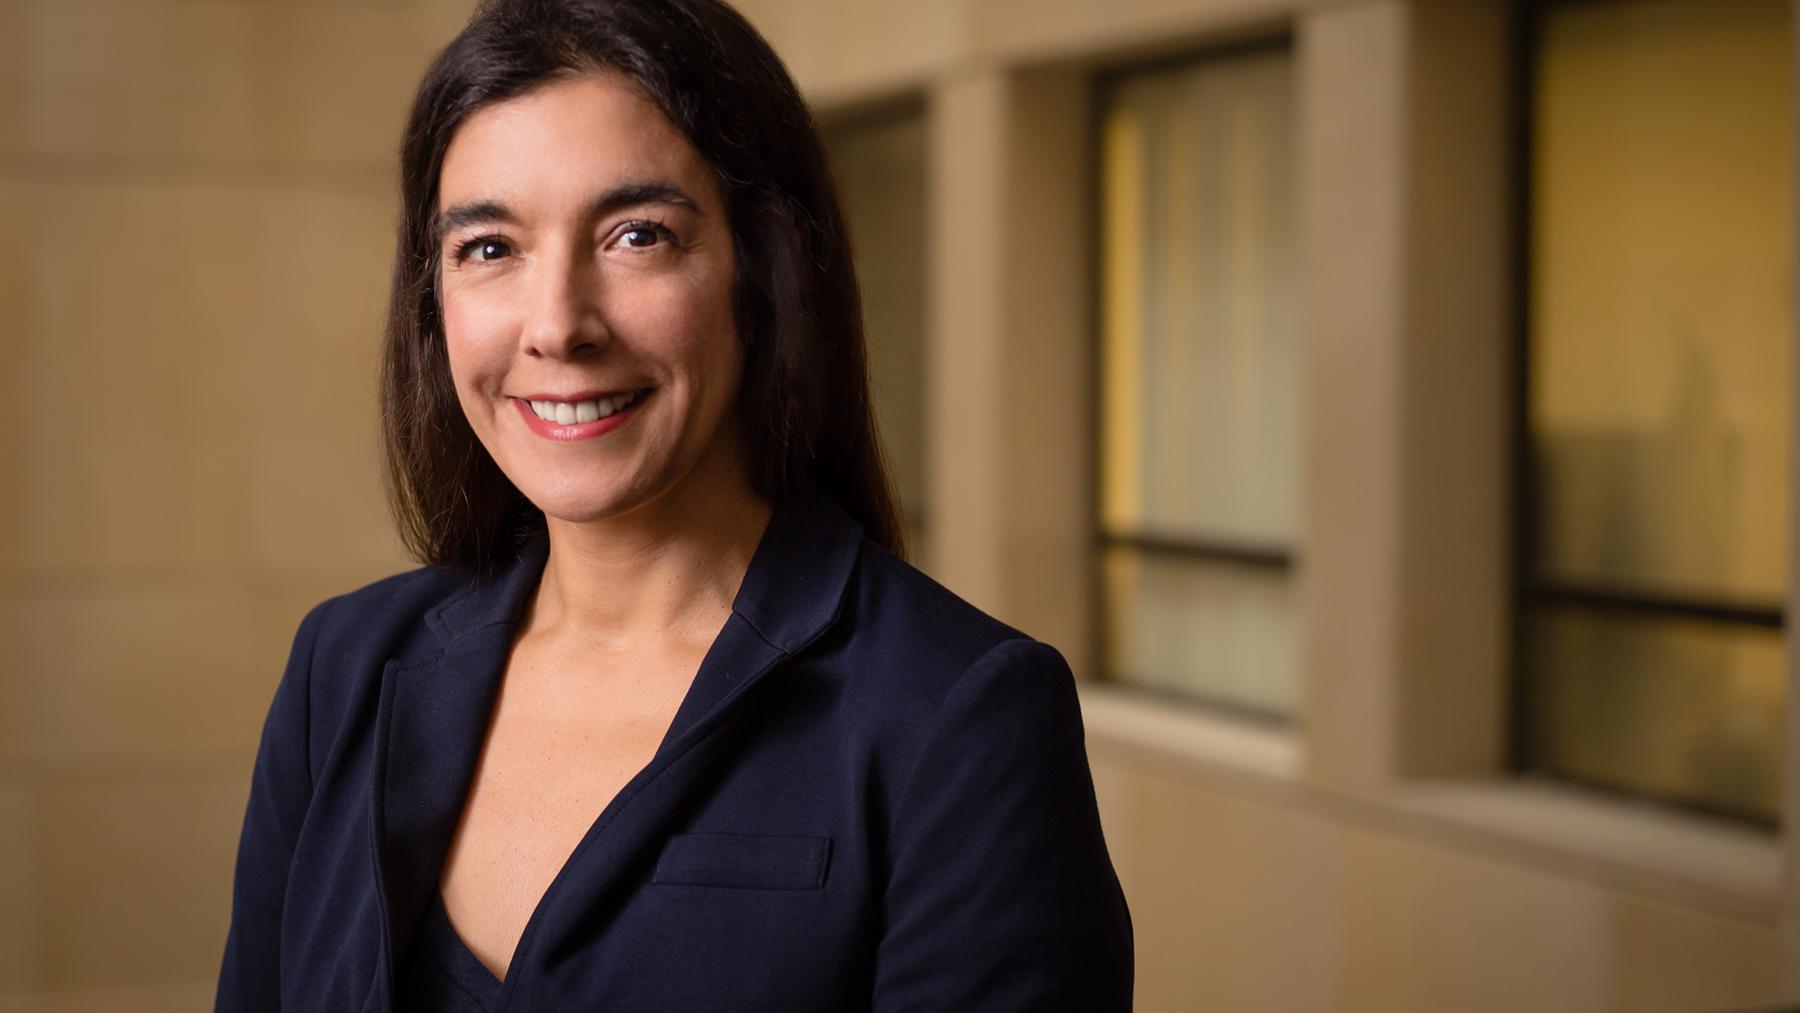 Psychology professor Dolores Albarracín. Photo by L. B. Stauffer